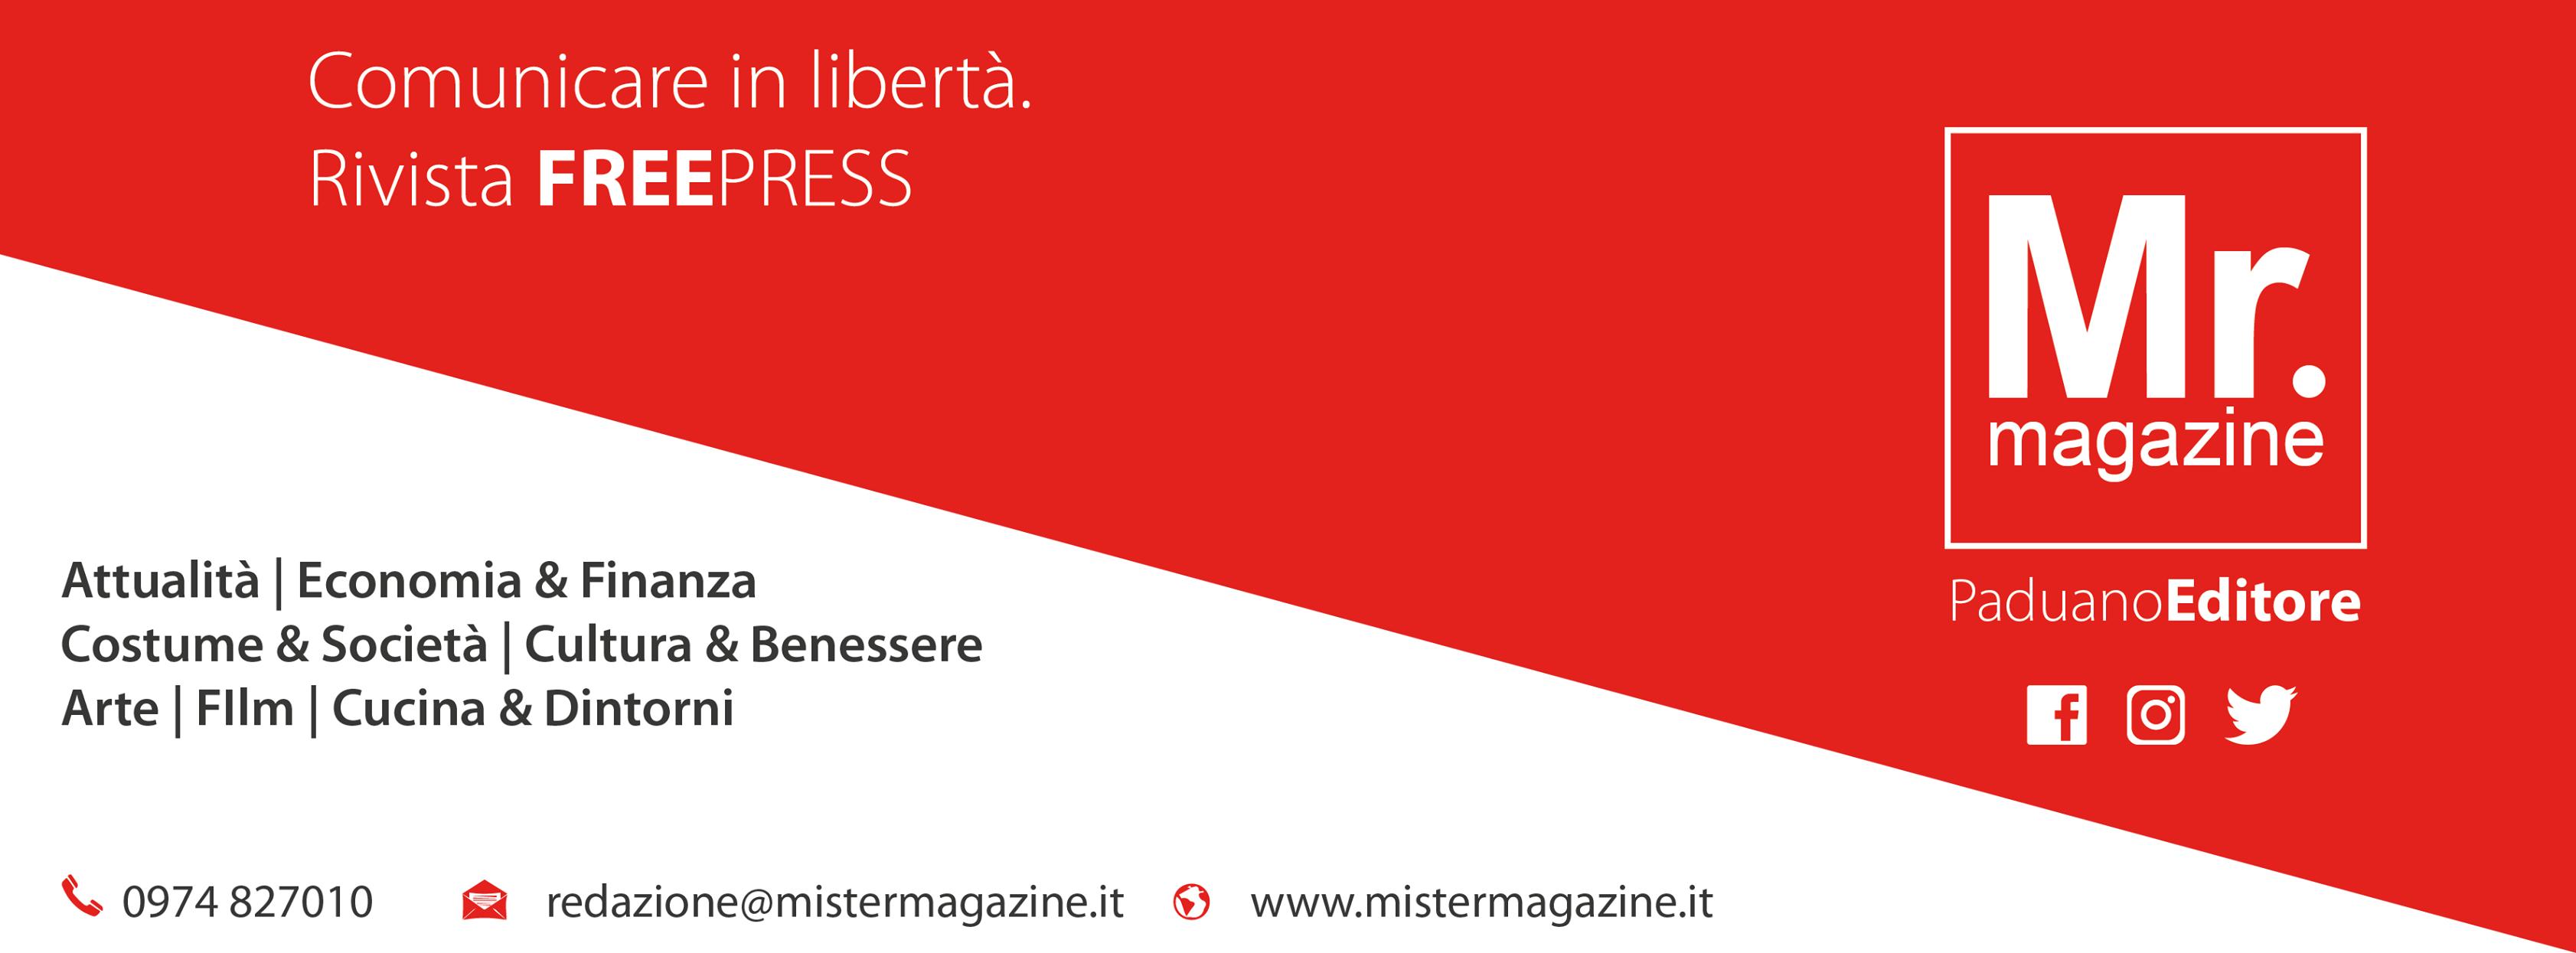 Mistermagazine rivista freepress